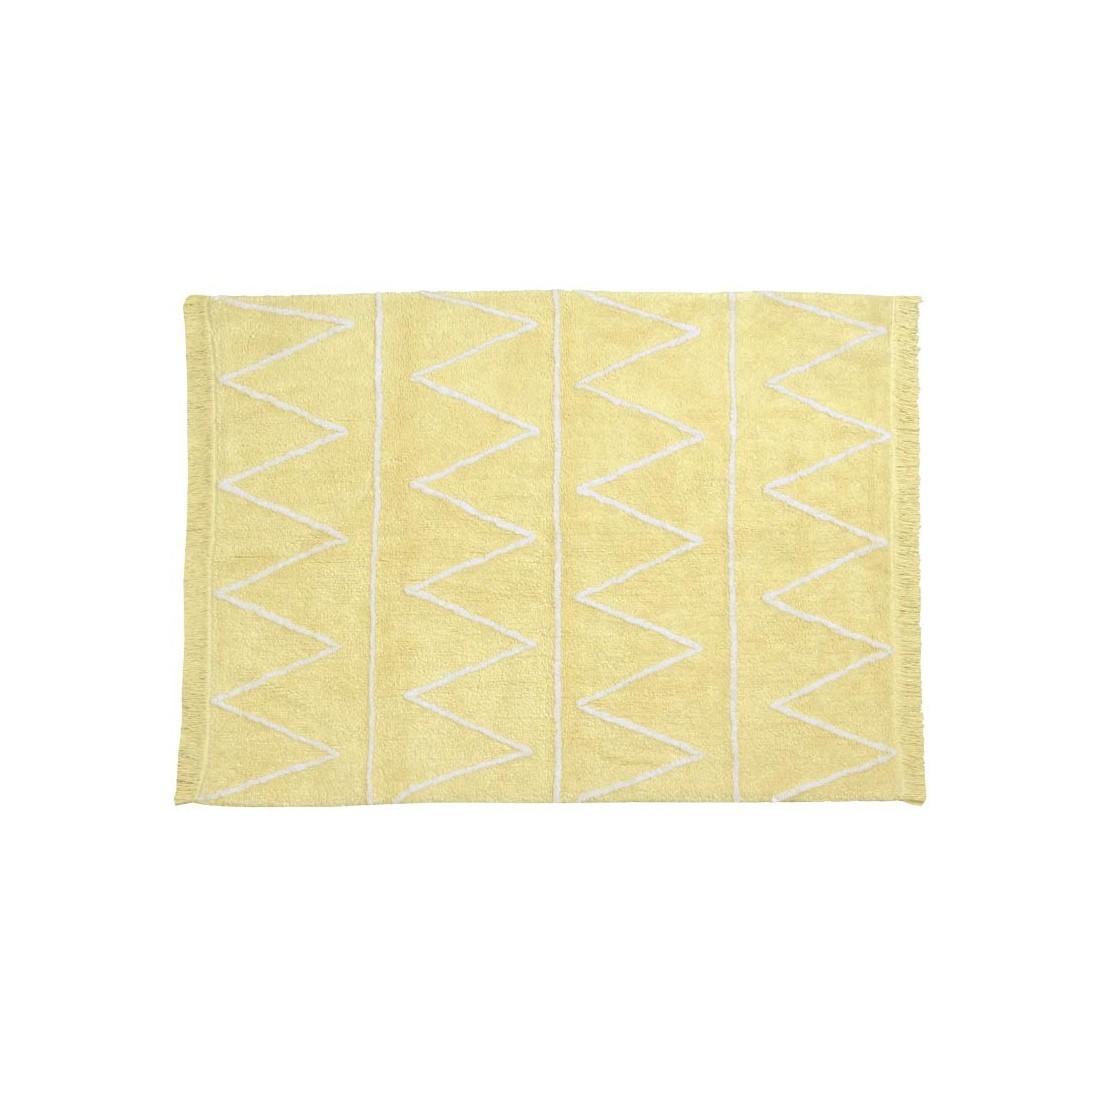 tapis enfant lavable hippy jaune ma chambramoi. Black Bedroom Furniture Sets. Home Design Ideas